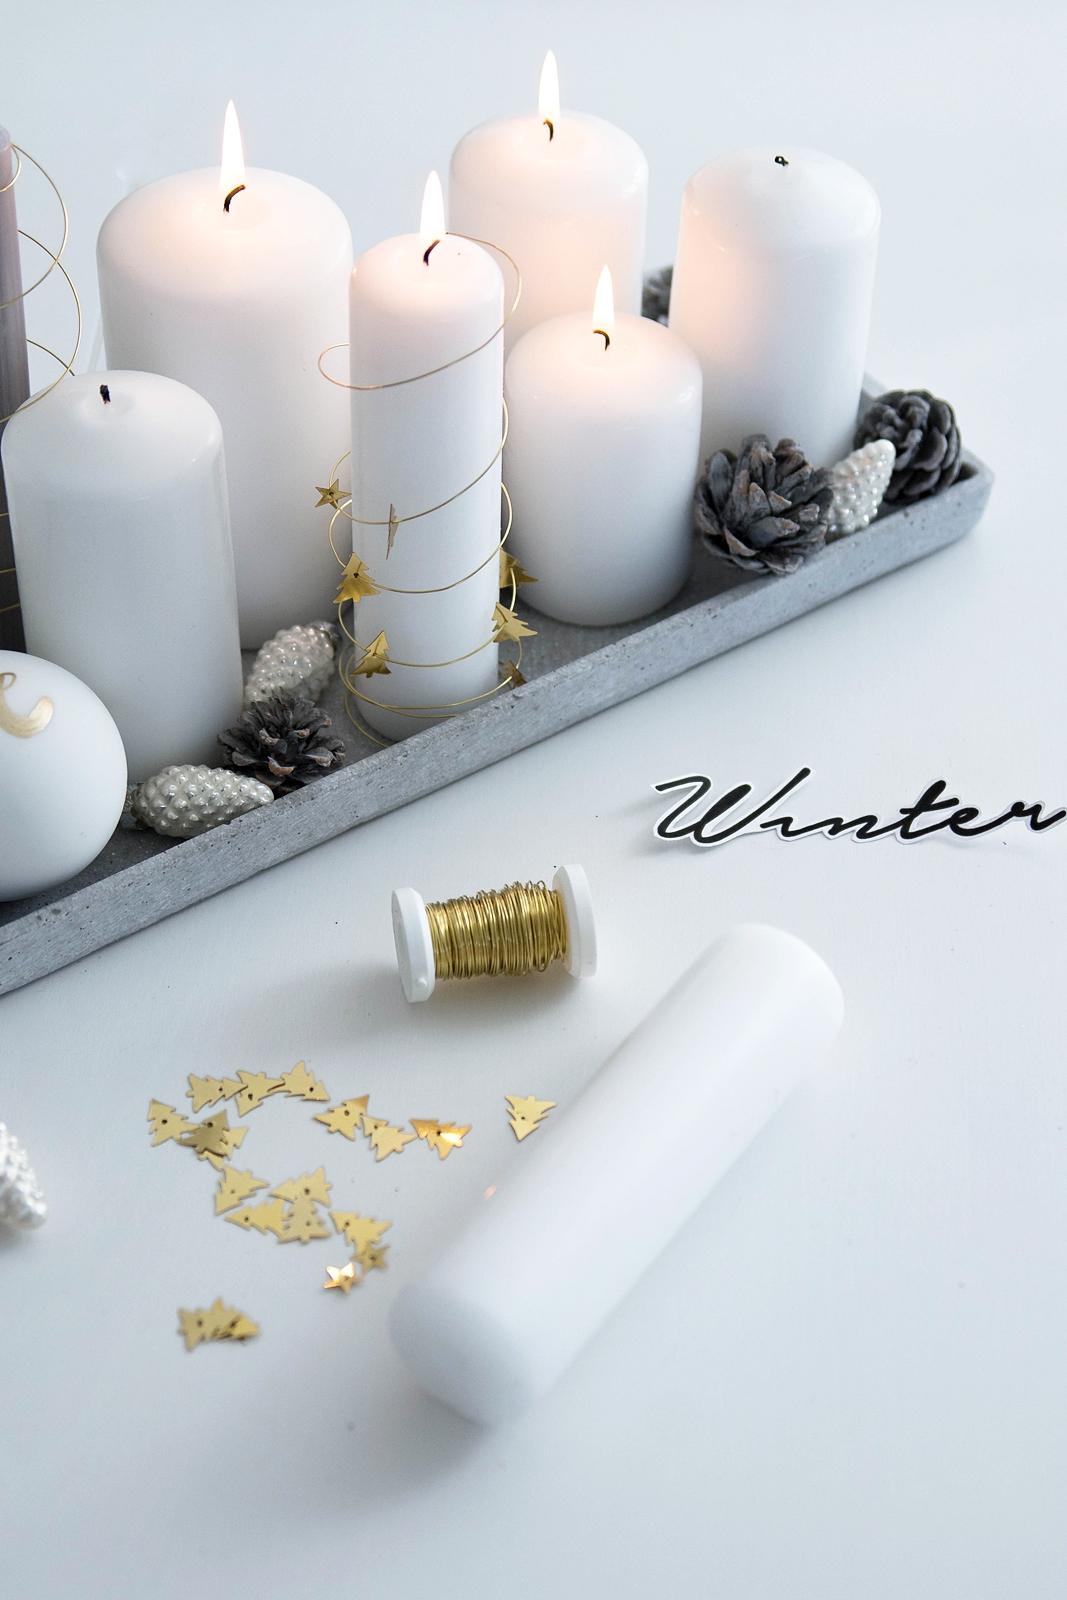 Last Minute Weihnachtsdeko: Kerzen im Drahtmantel